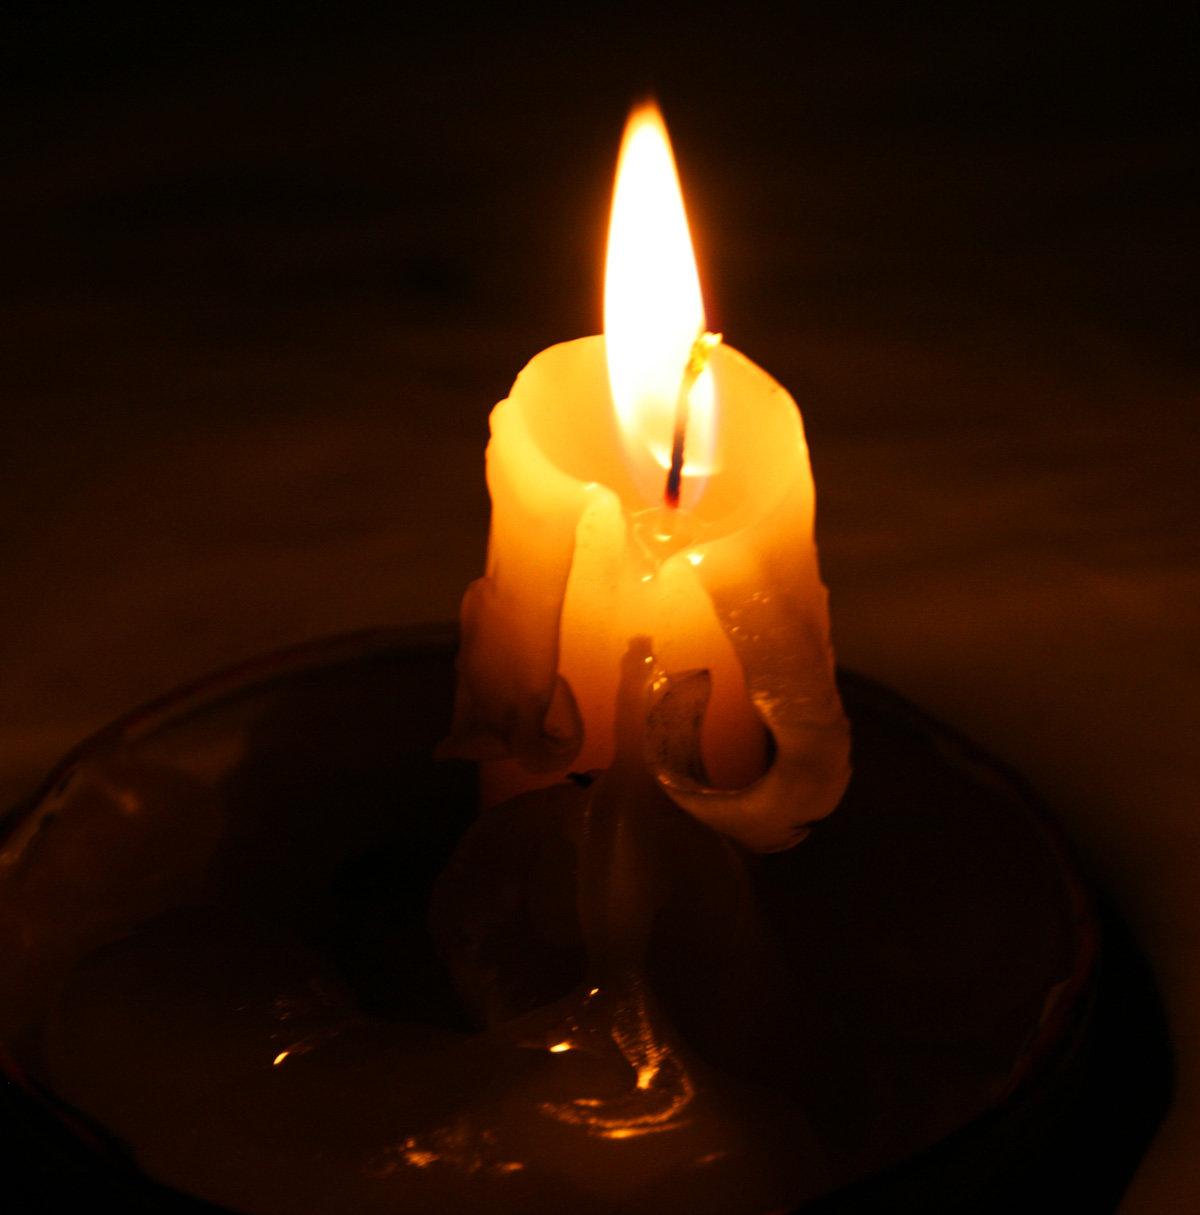 свеча в темноте картинка